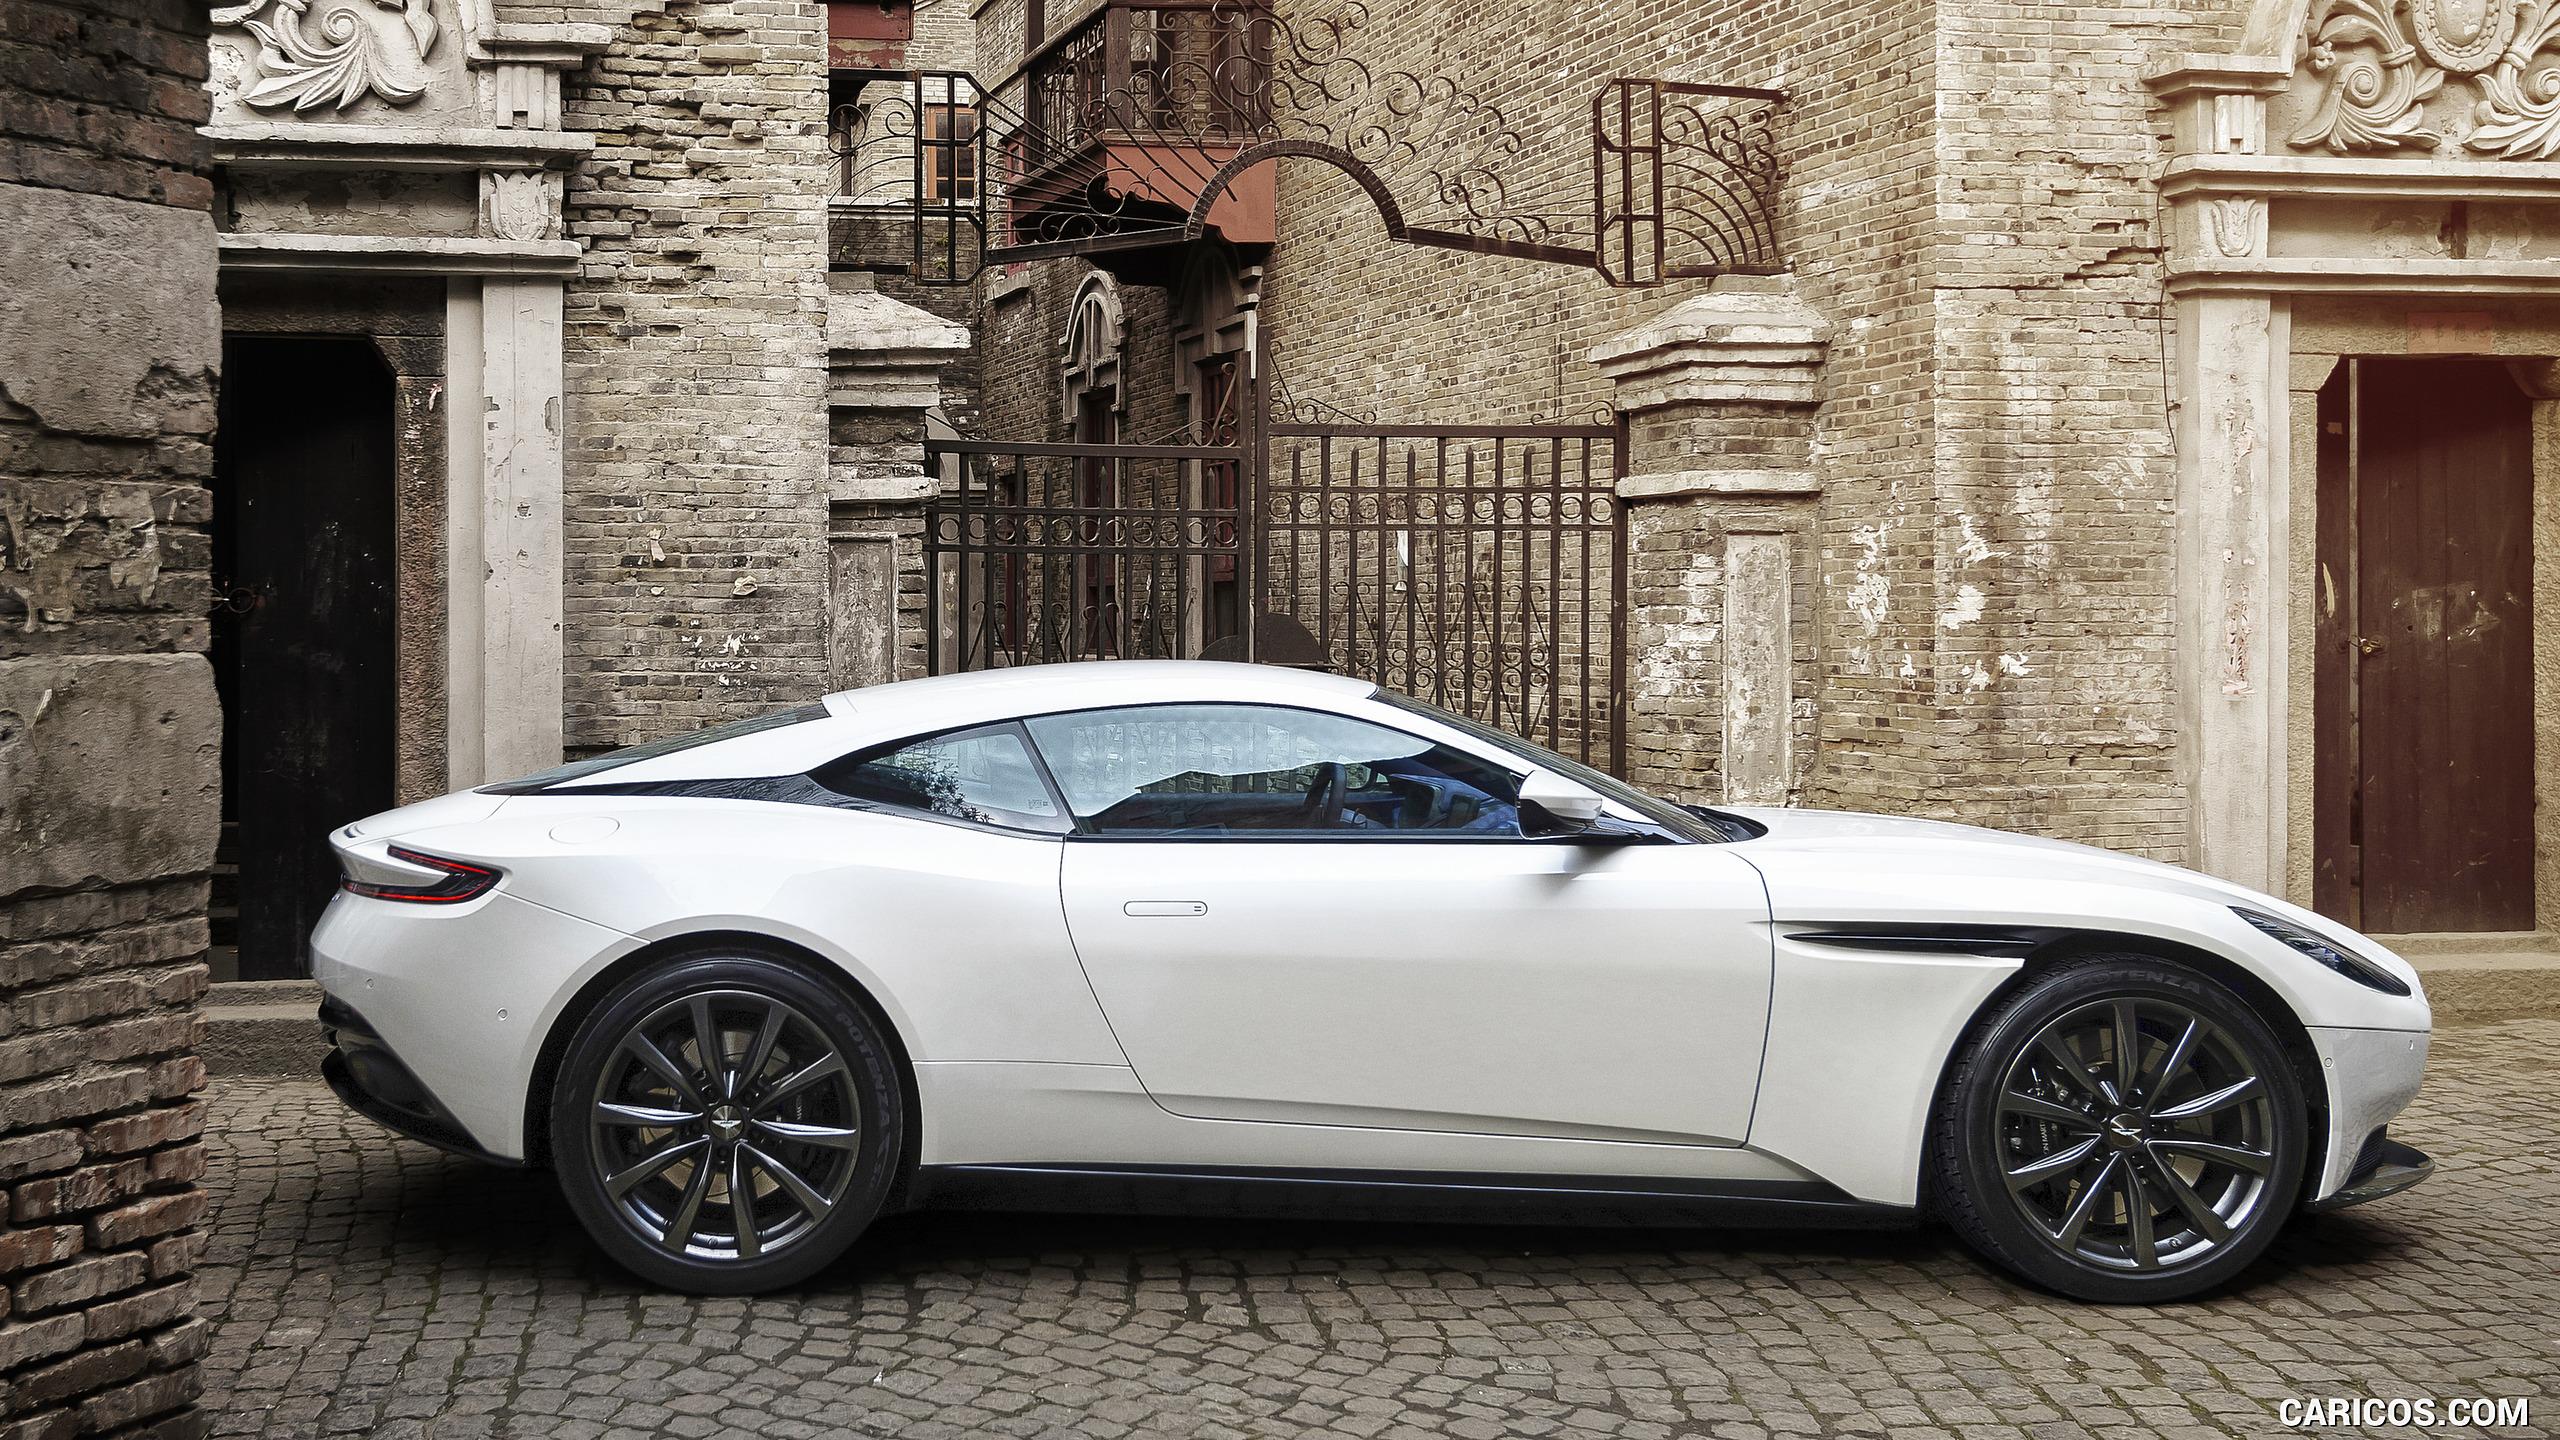 2018 Aston Martin DB11 V8 HD Wallpaper 4 2560x1440